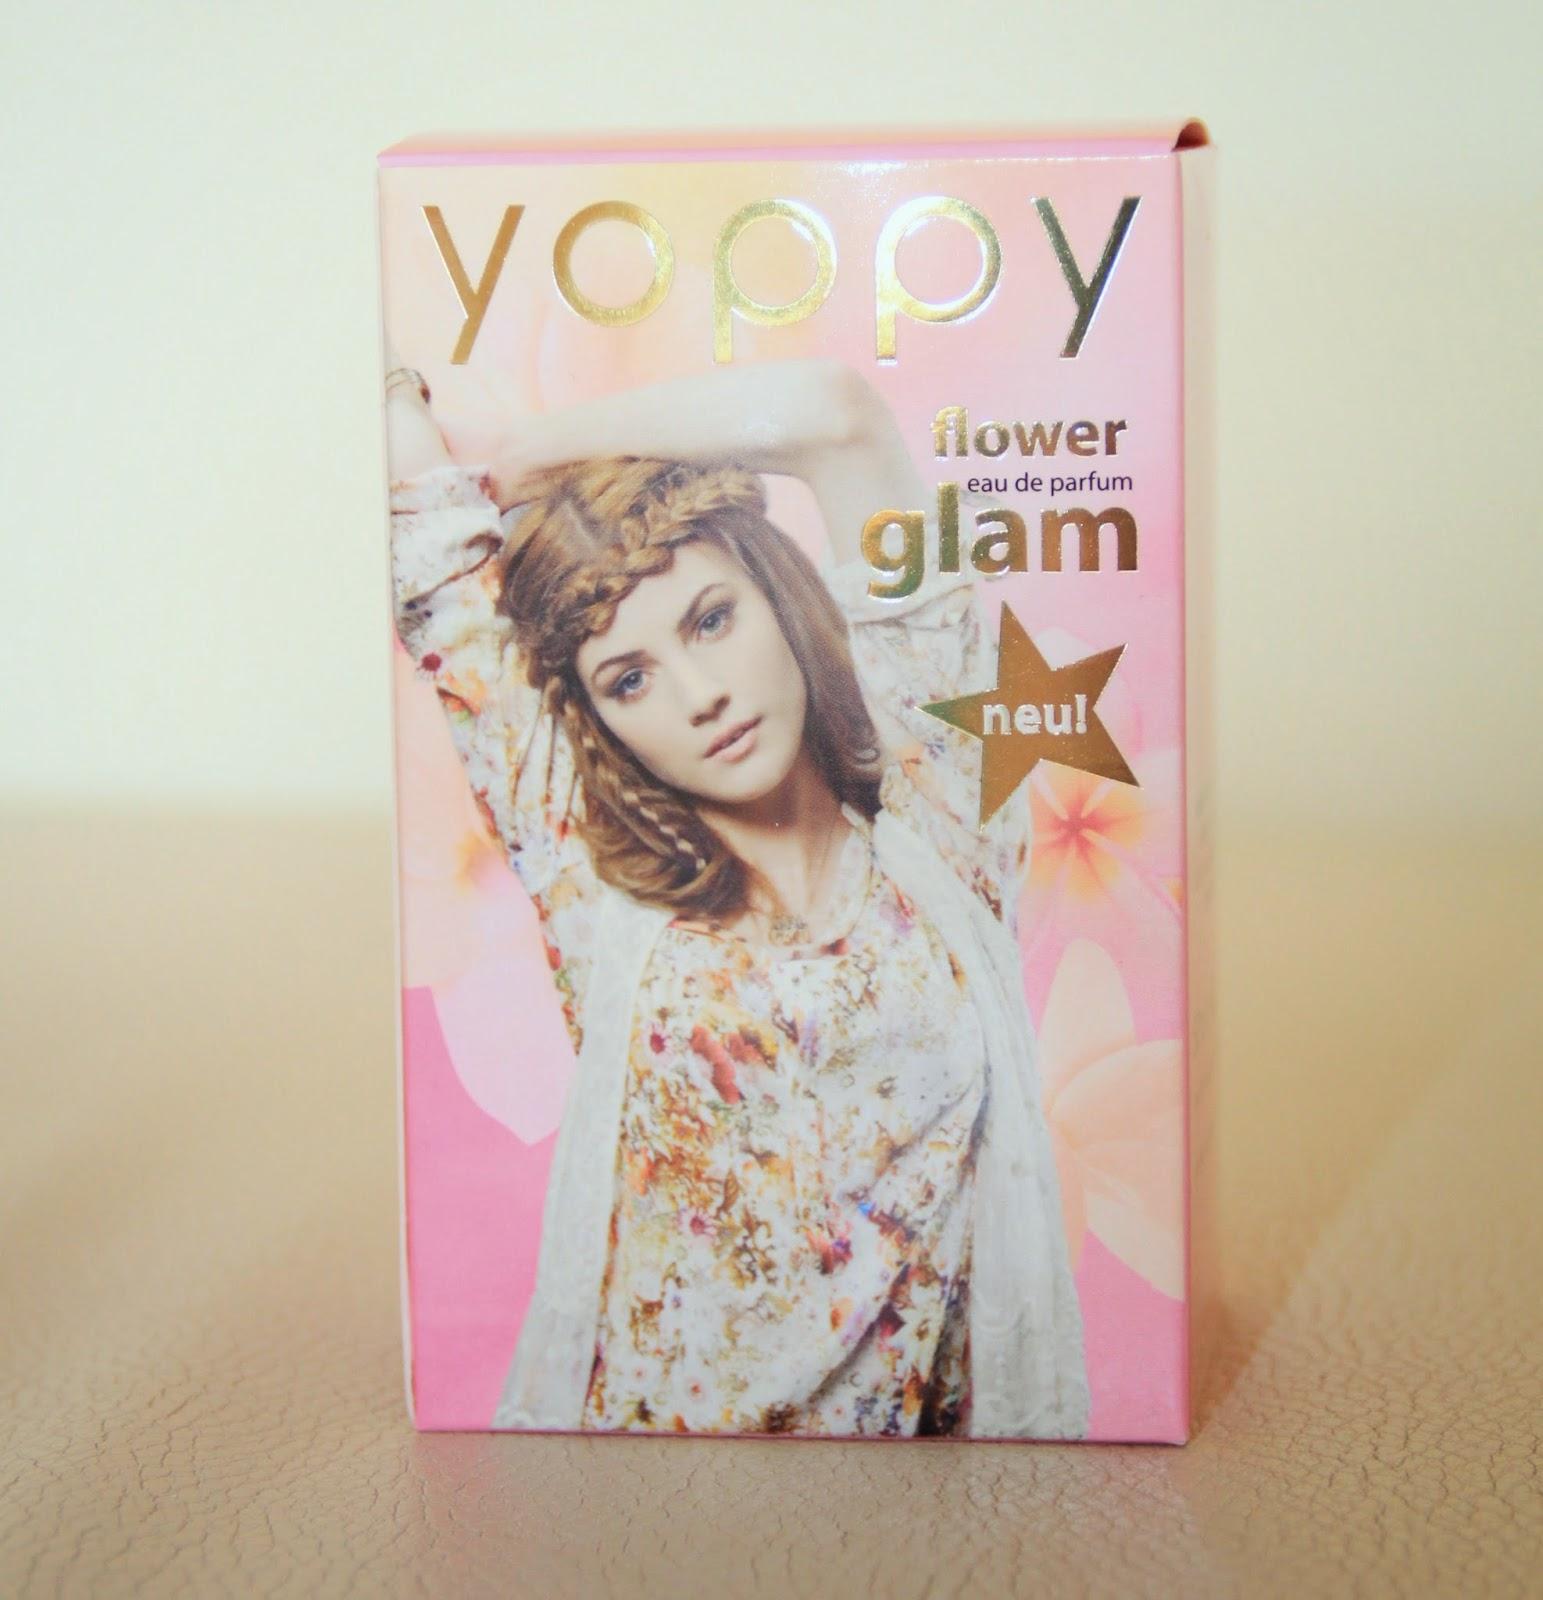 jucheer testet yoppi flower glam eine liebeserkl rung an den fr hling. Black Bedroom Furniture Sets. Home Design Ideas